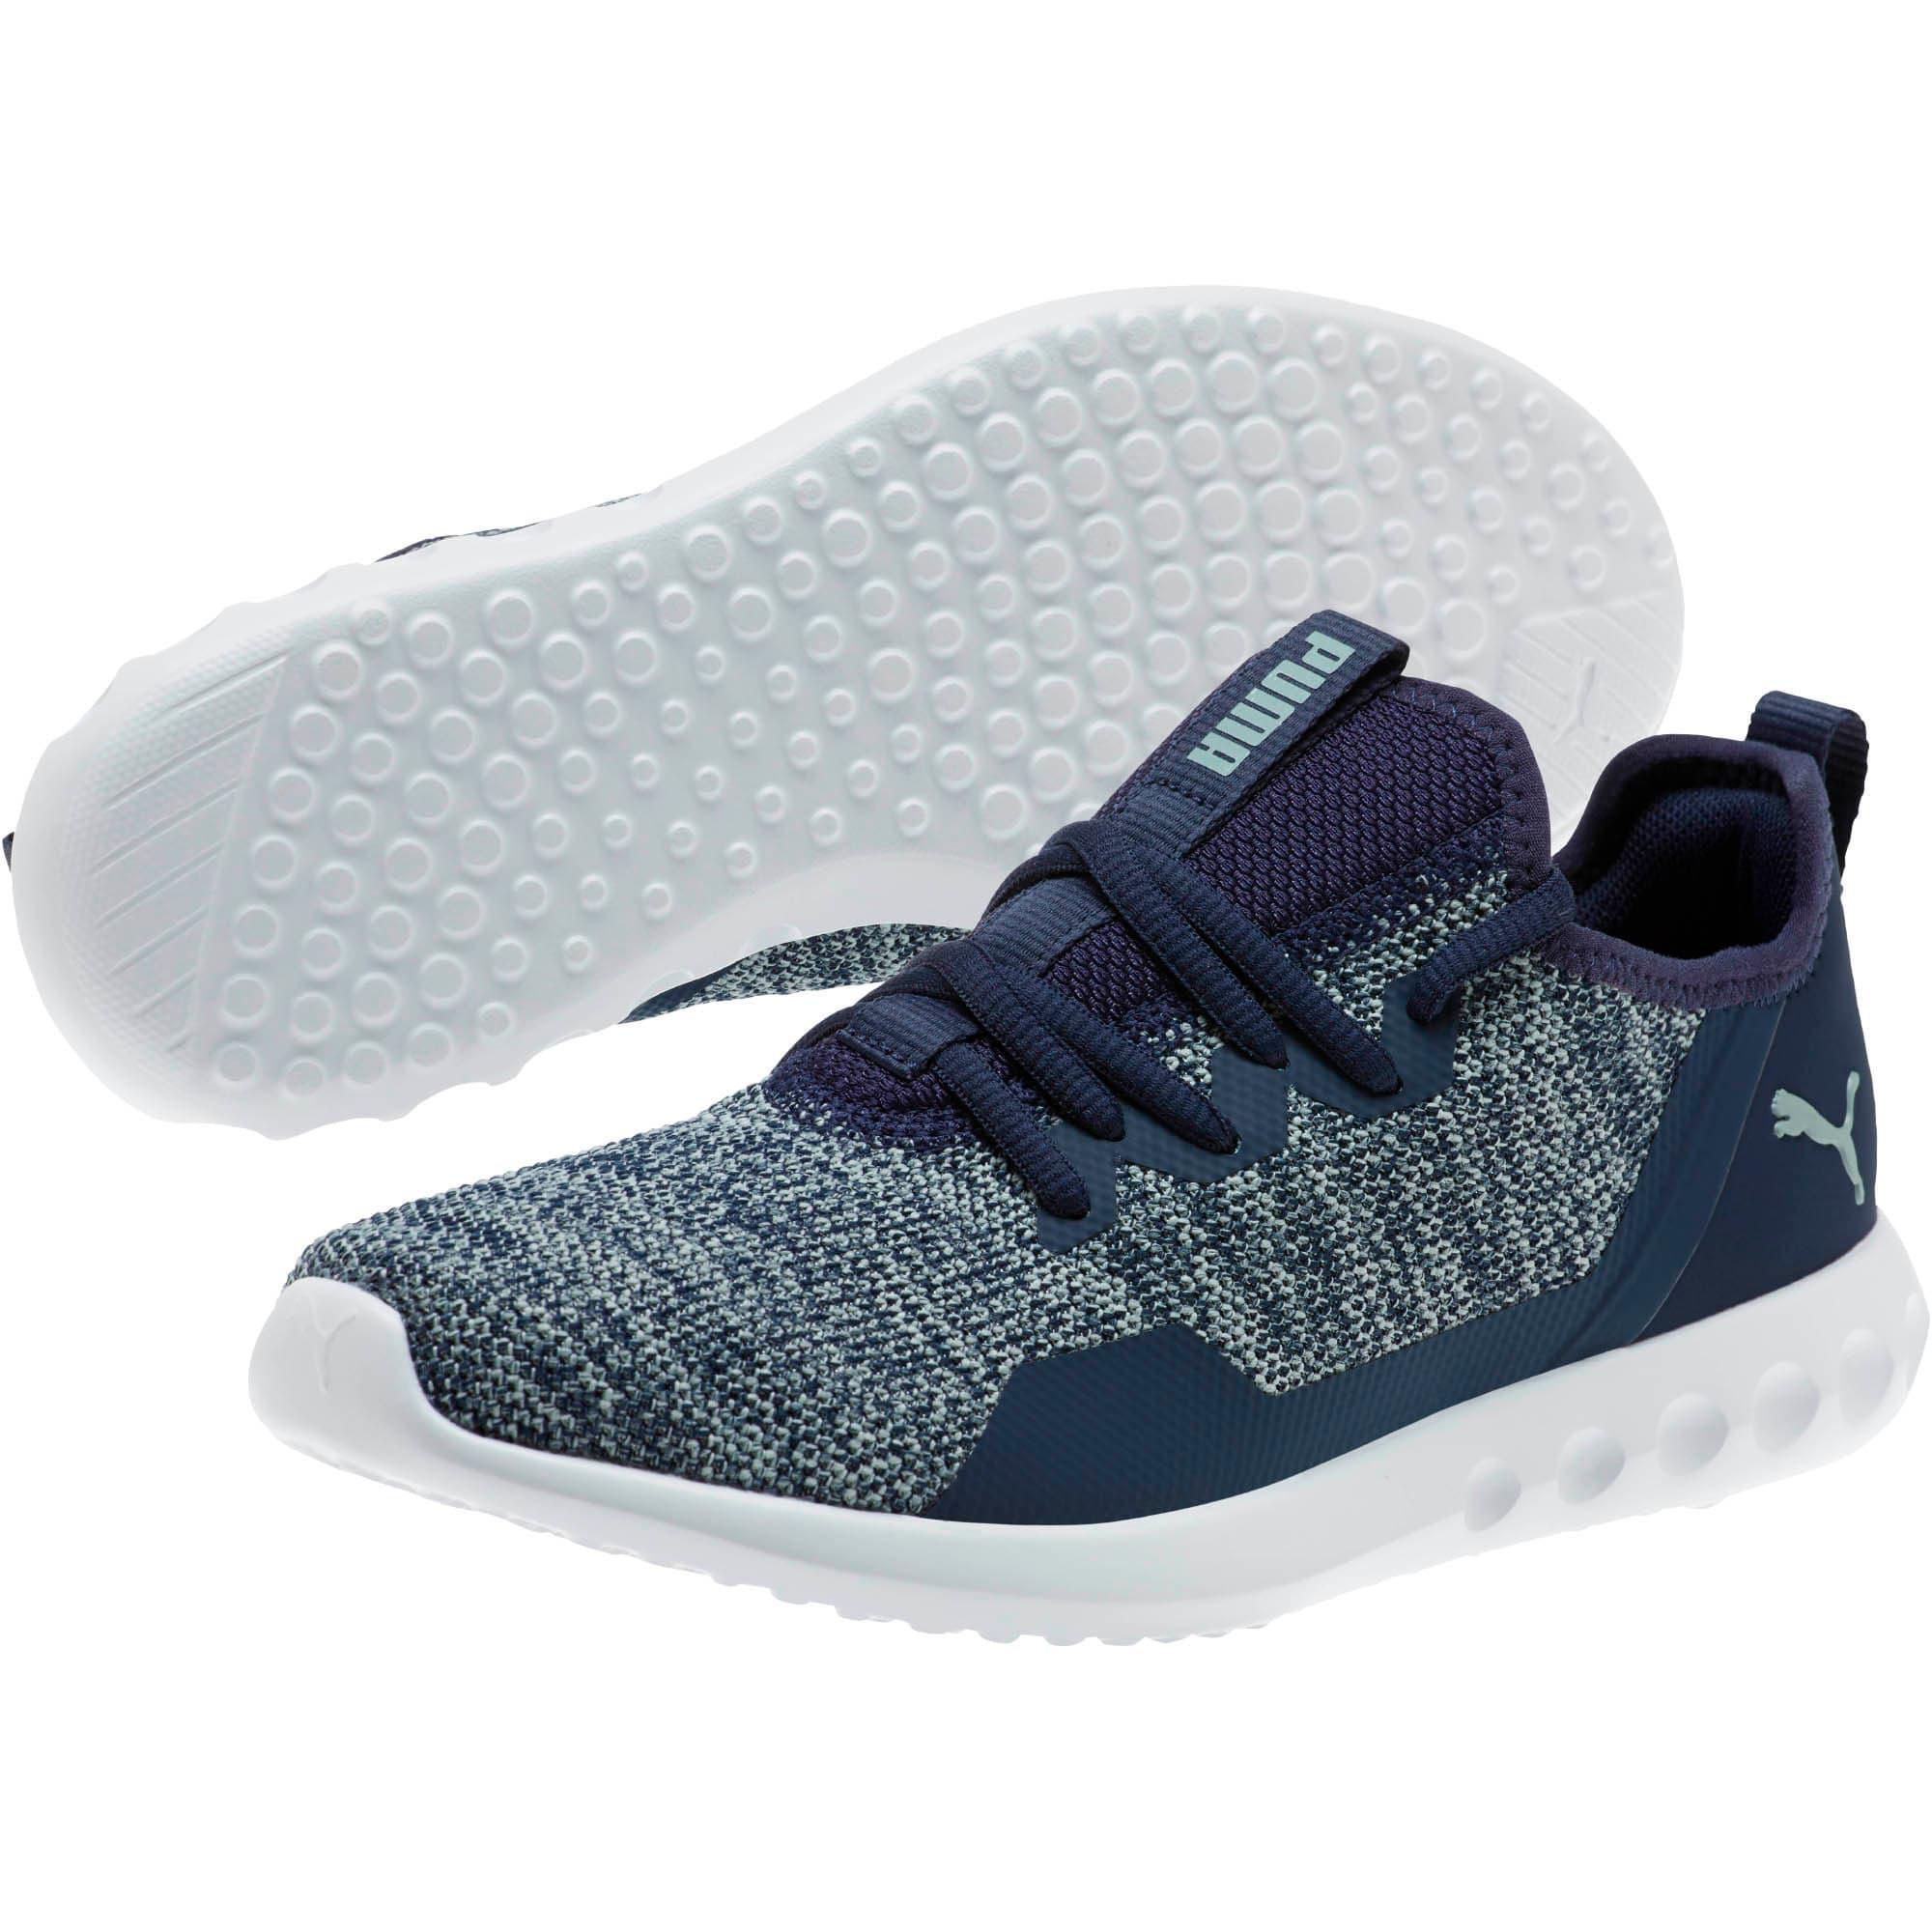 Thumbnail 2 of Carson 2 X Knit Women's Running Shoes, Peacoat-Quarry, medium